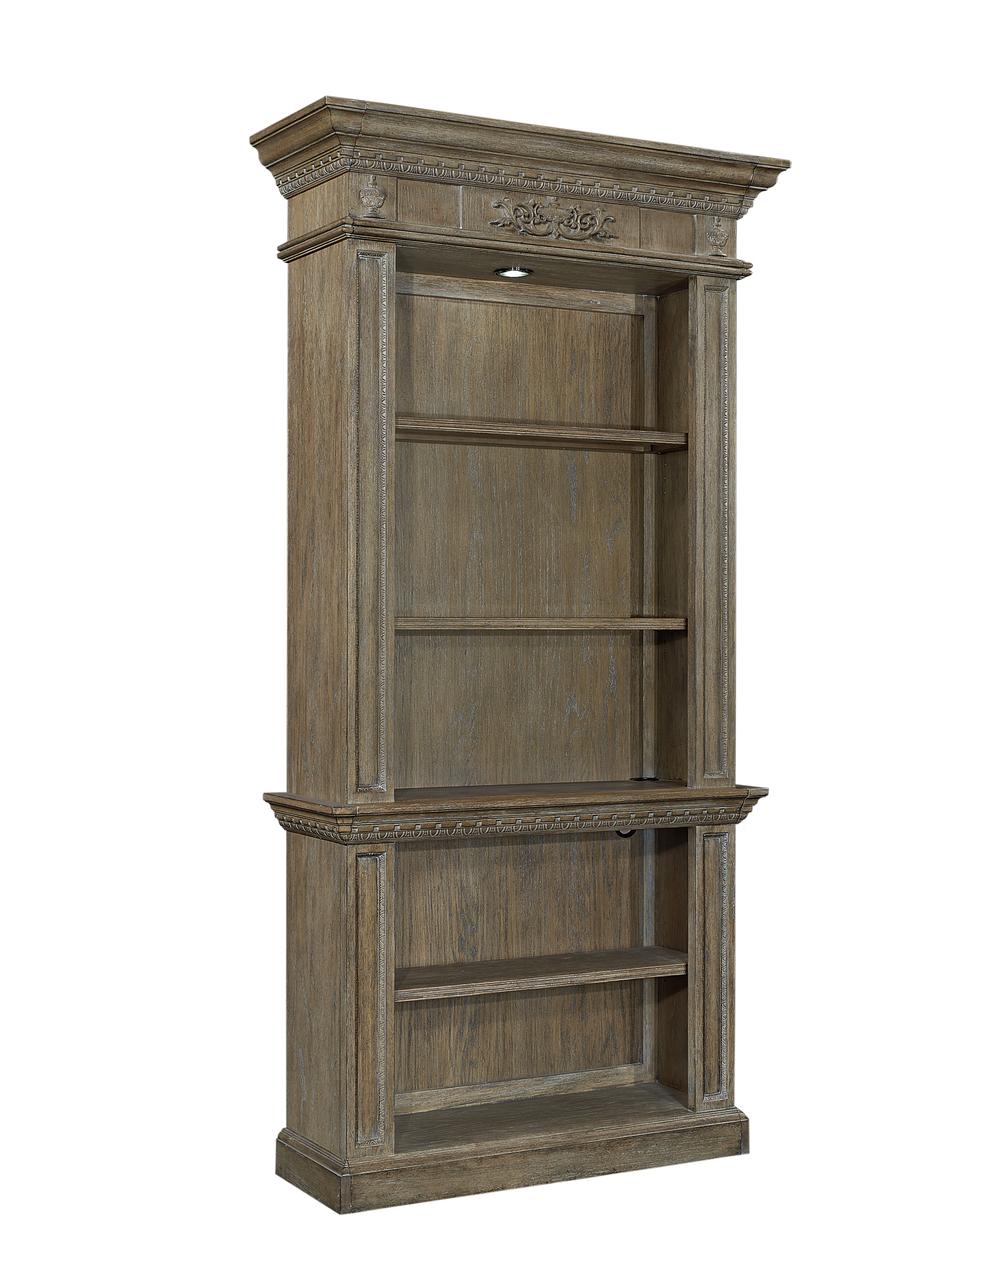 Aspenhome - Belle Maison Open Bookcase